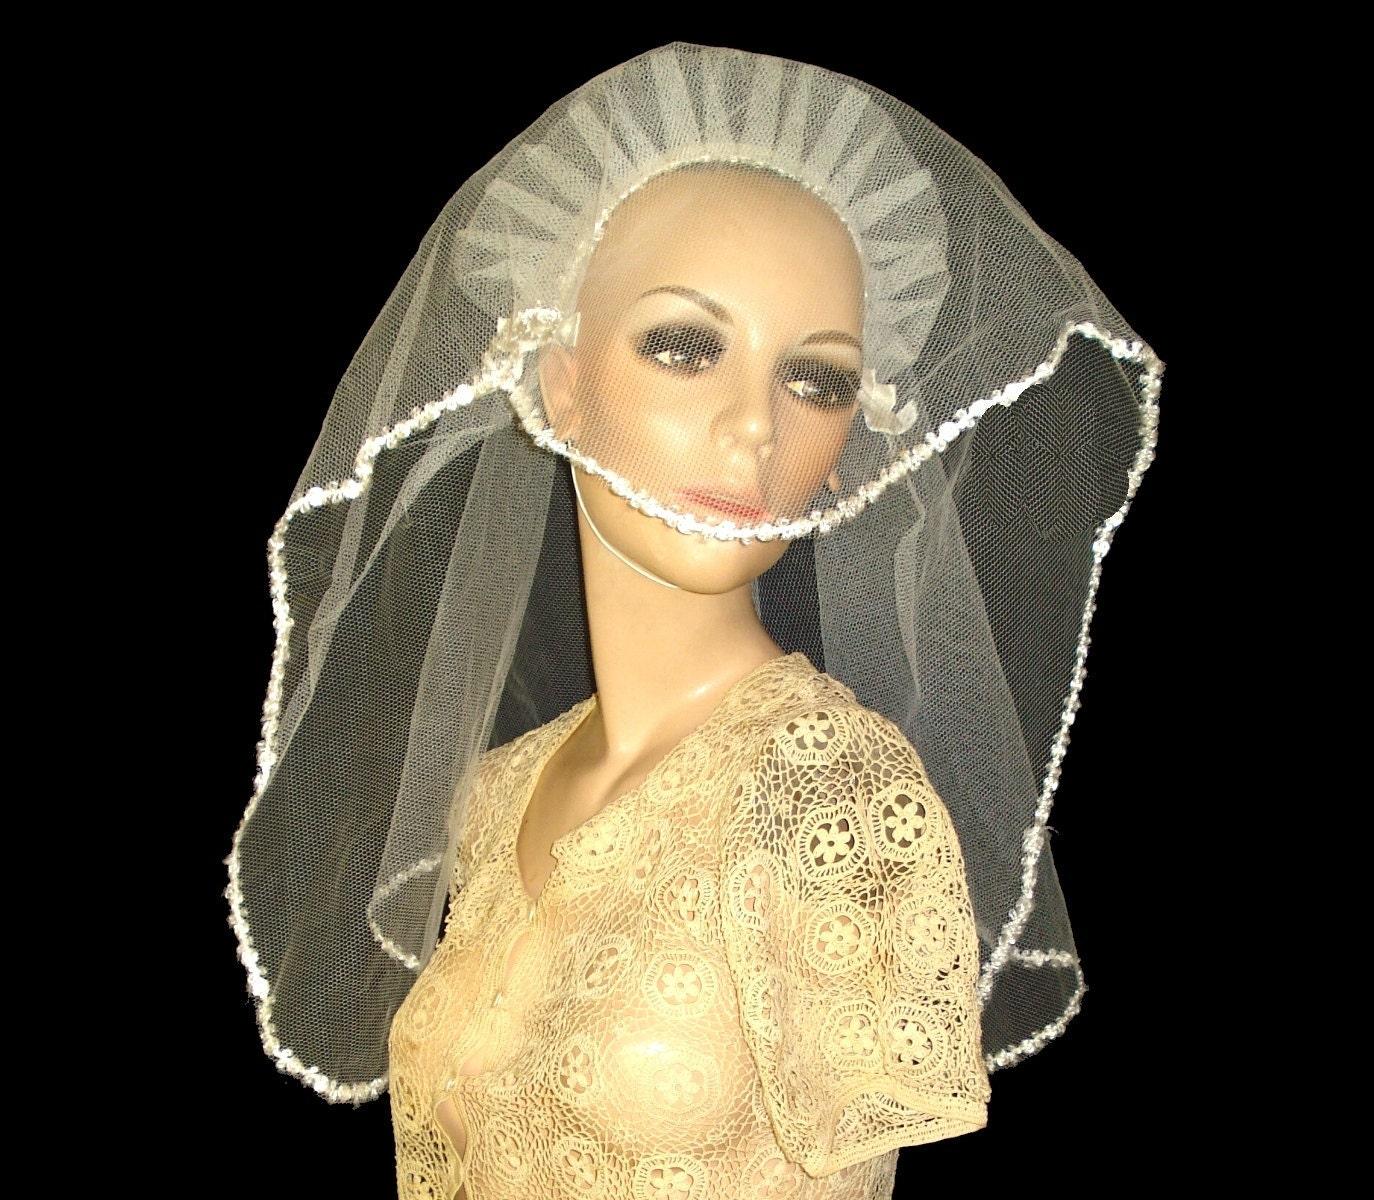 Headpieces For Wedding Veils: Vintage 1940s Wedding Veil Headpiece Headband Hat Dress Gown